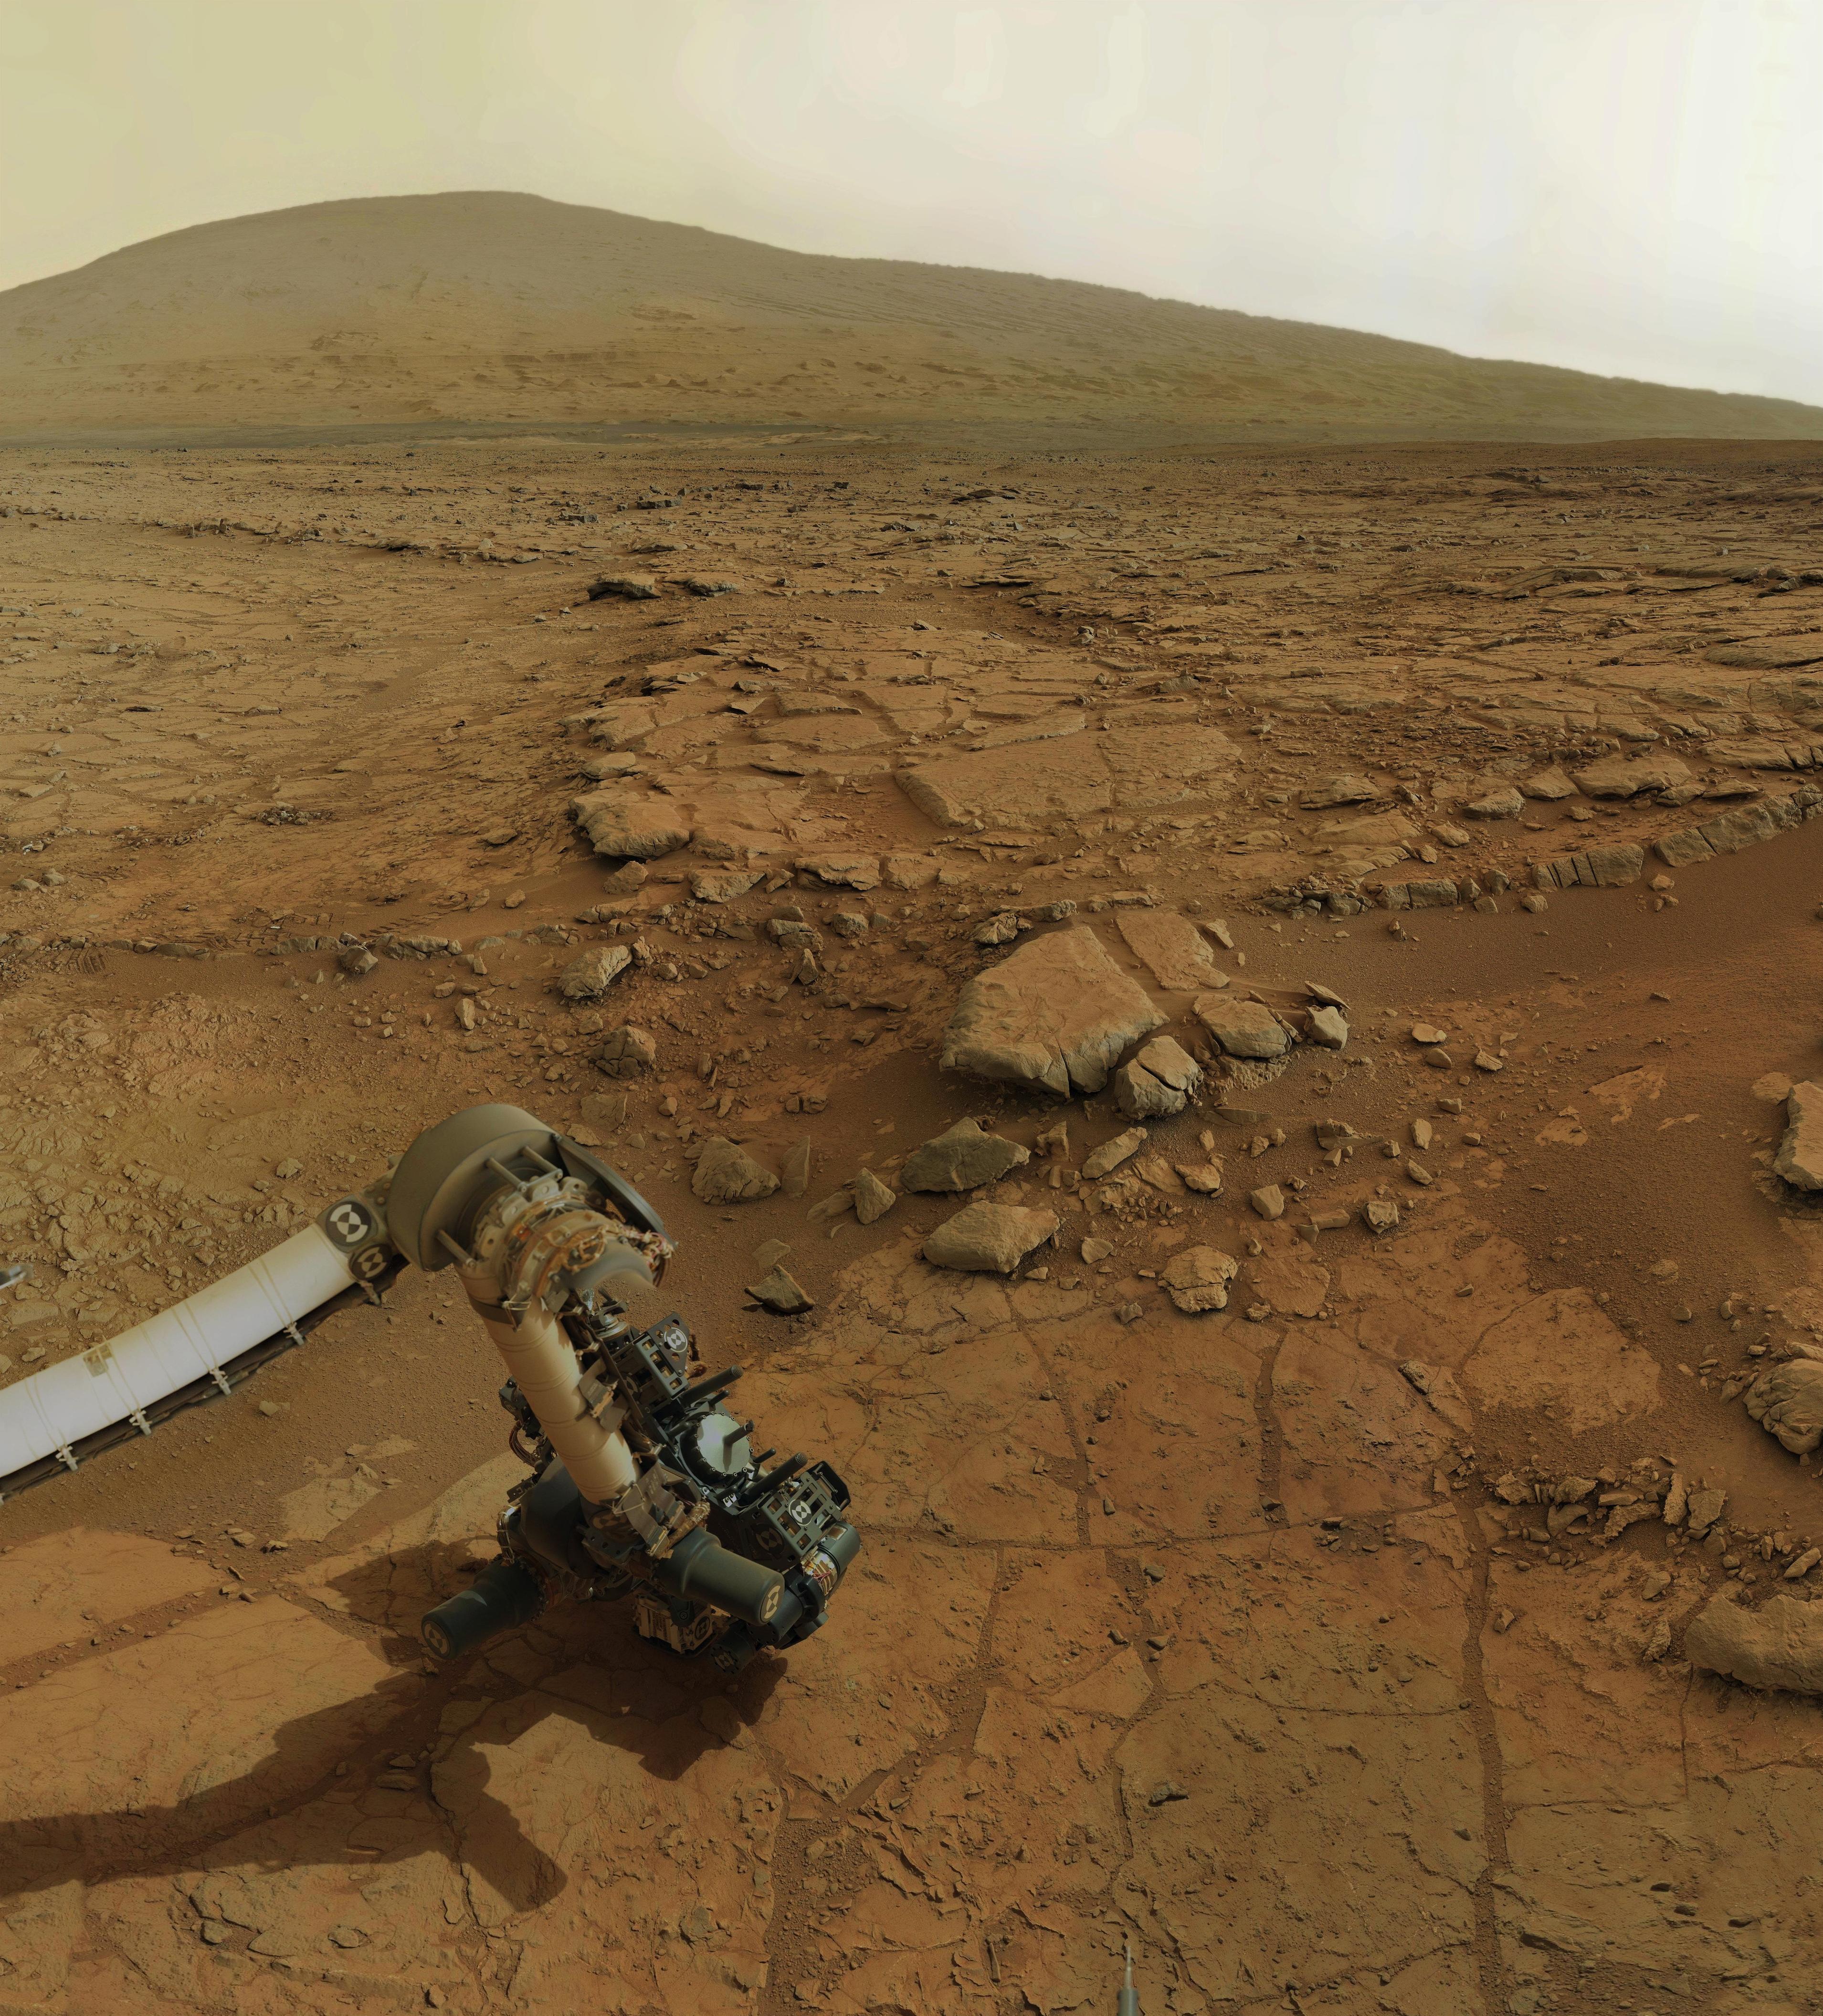 MarsCuriosityRover-Drilling-Sol170++-2.j